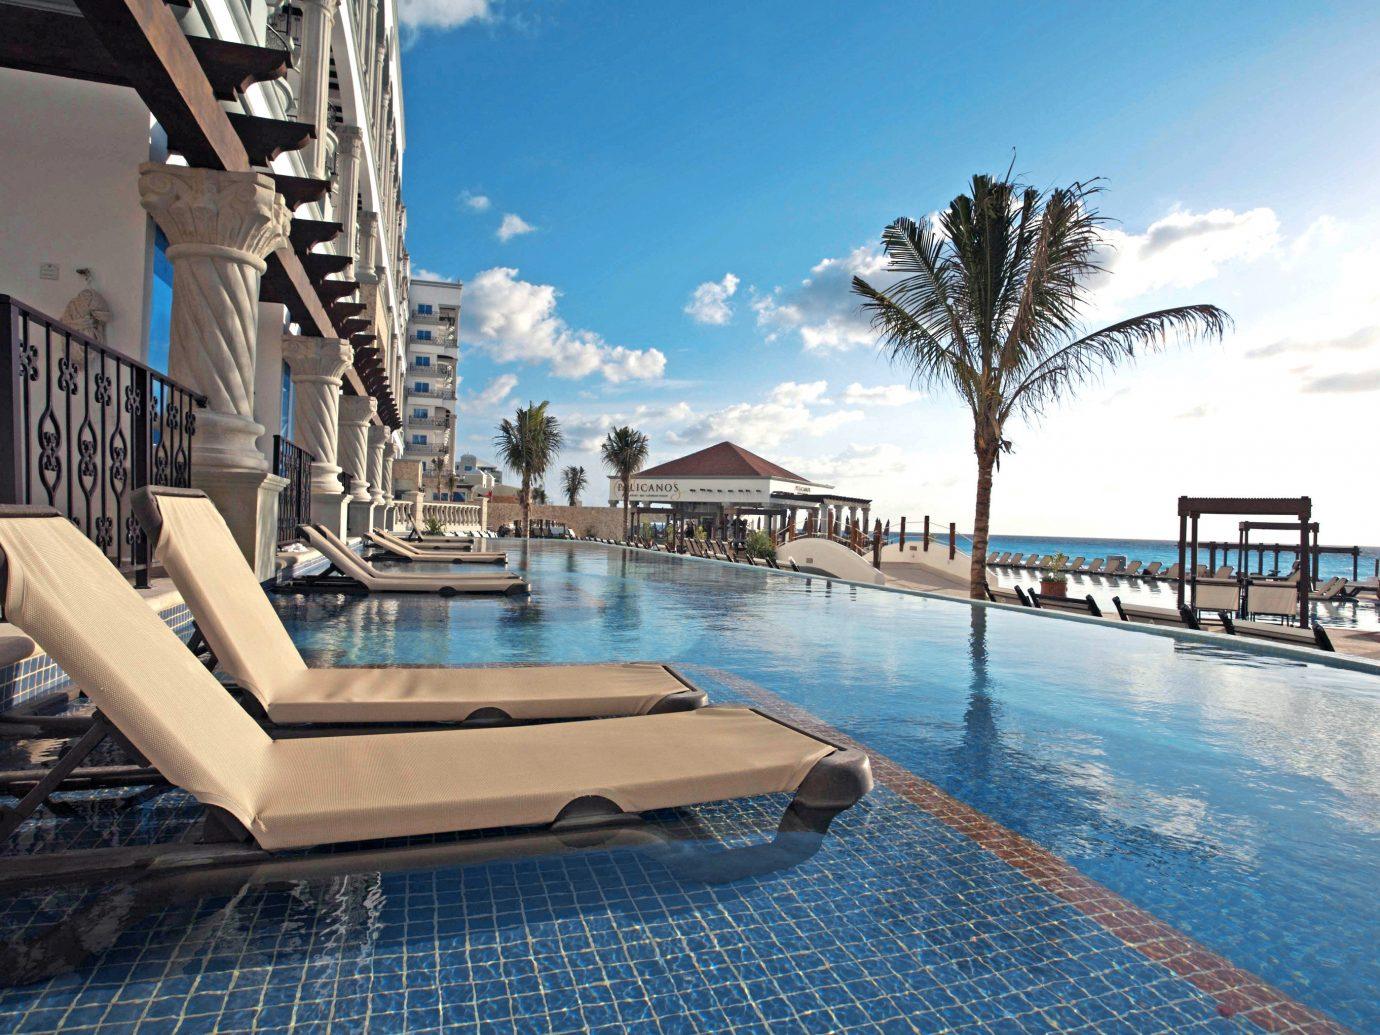 Hotel Riu Cancun Updated 2021 Prices Resort All Inclusive Reviews Mexico Tripadvisor